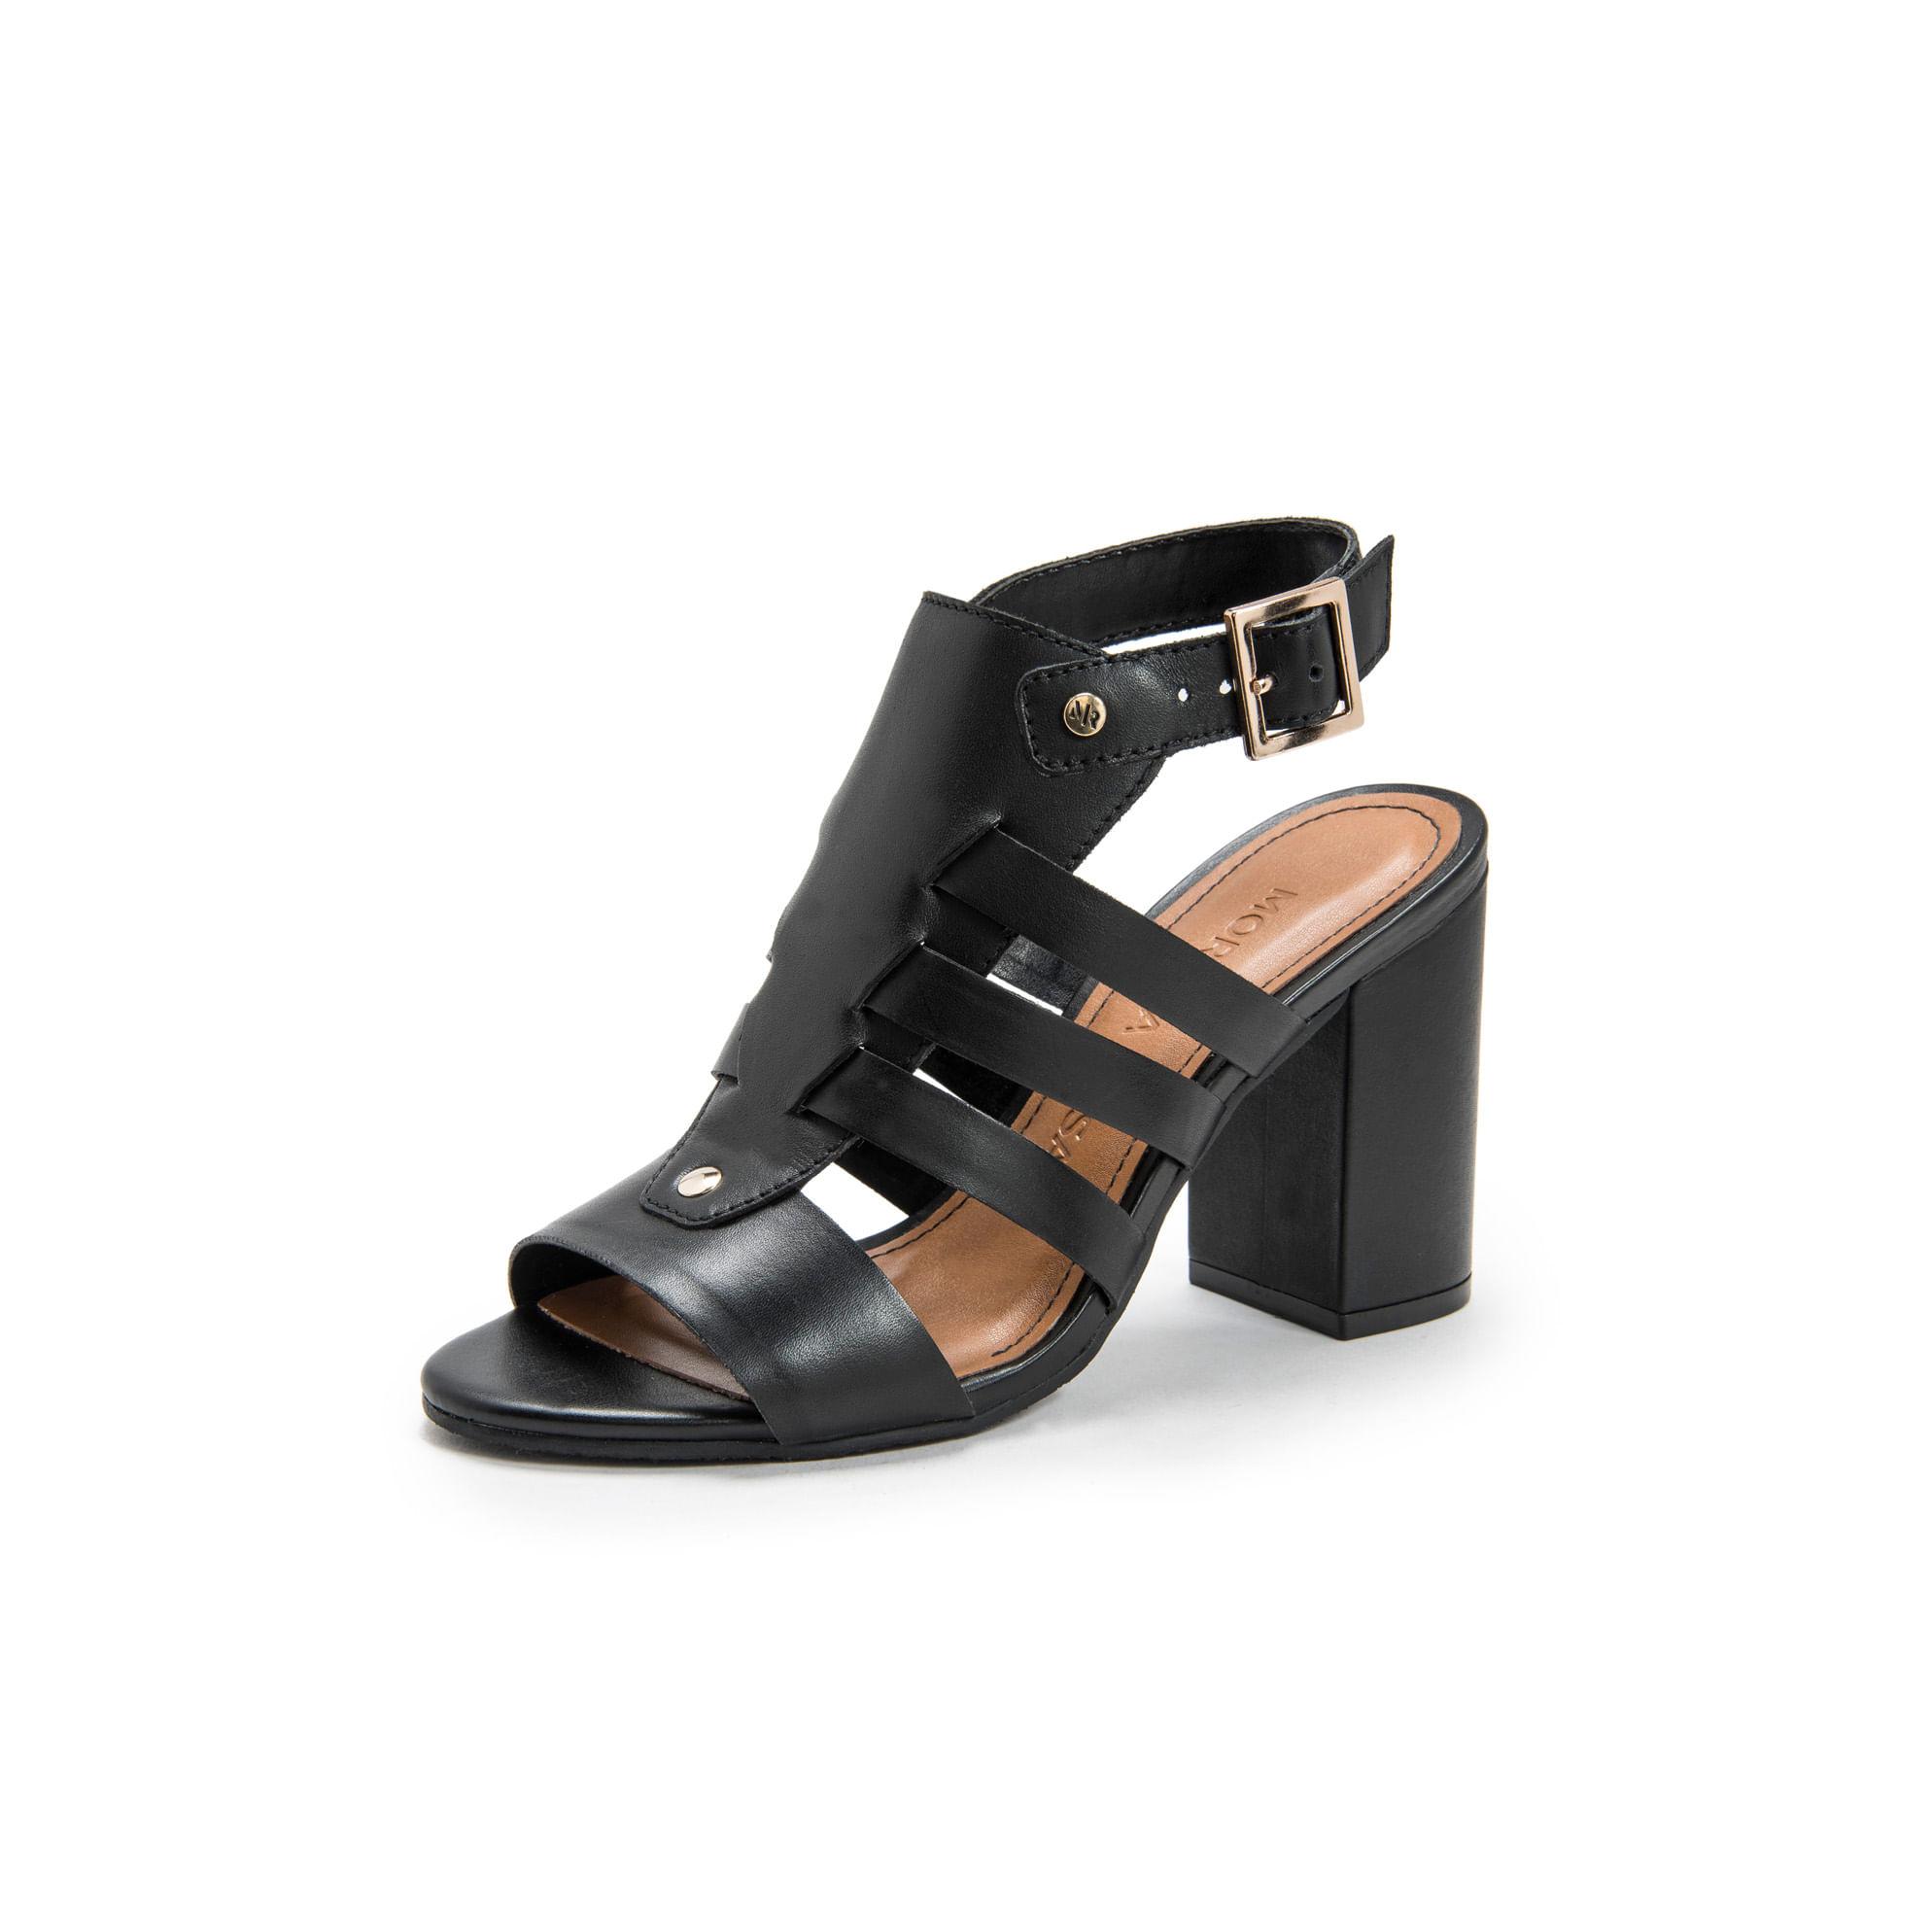 22ac853476 Sandalia Salto Alto Estilo Sandal Boot Com Detalhe De Tiras Preto ...